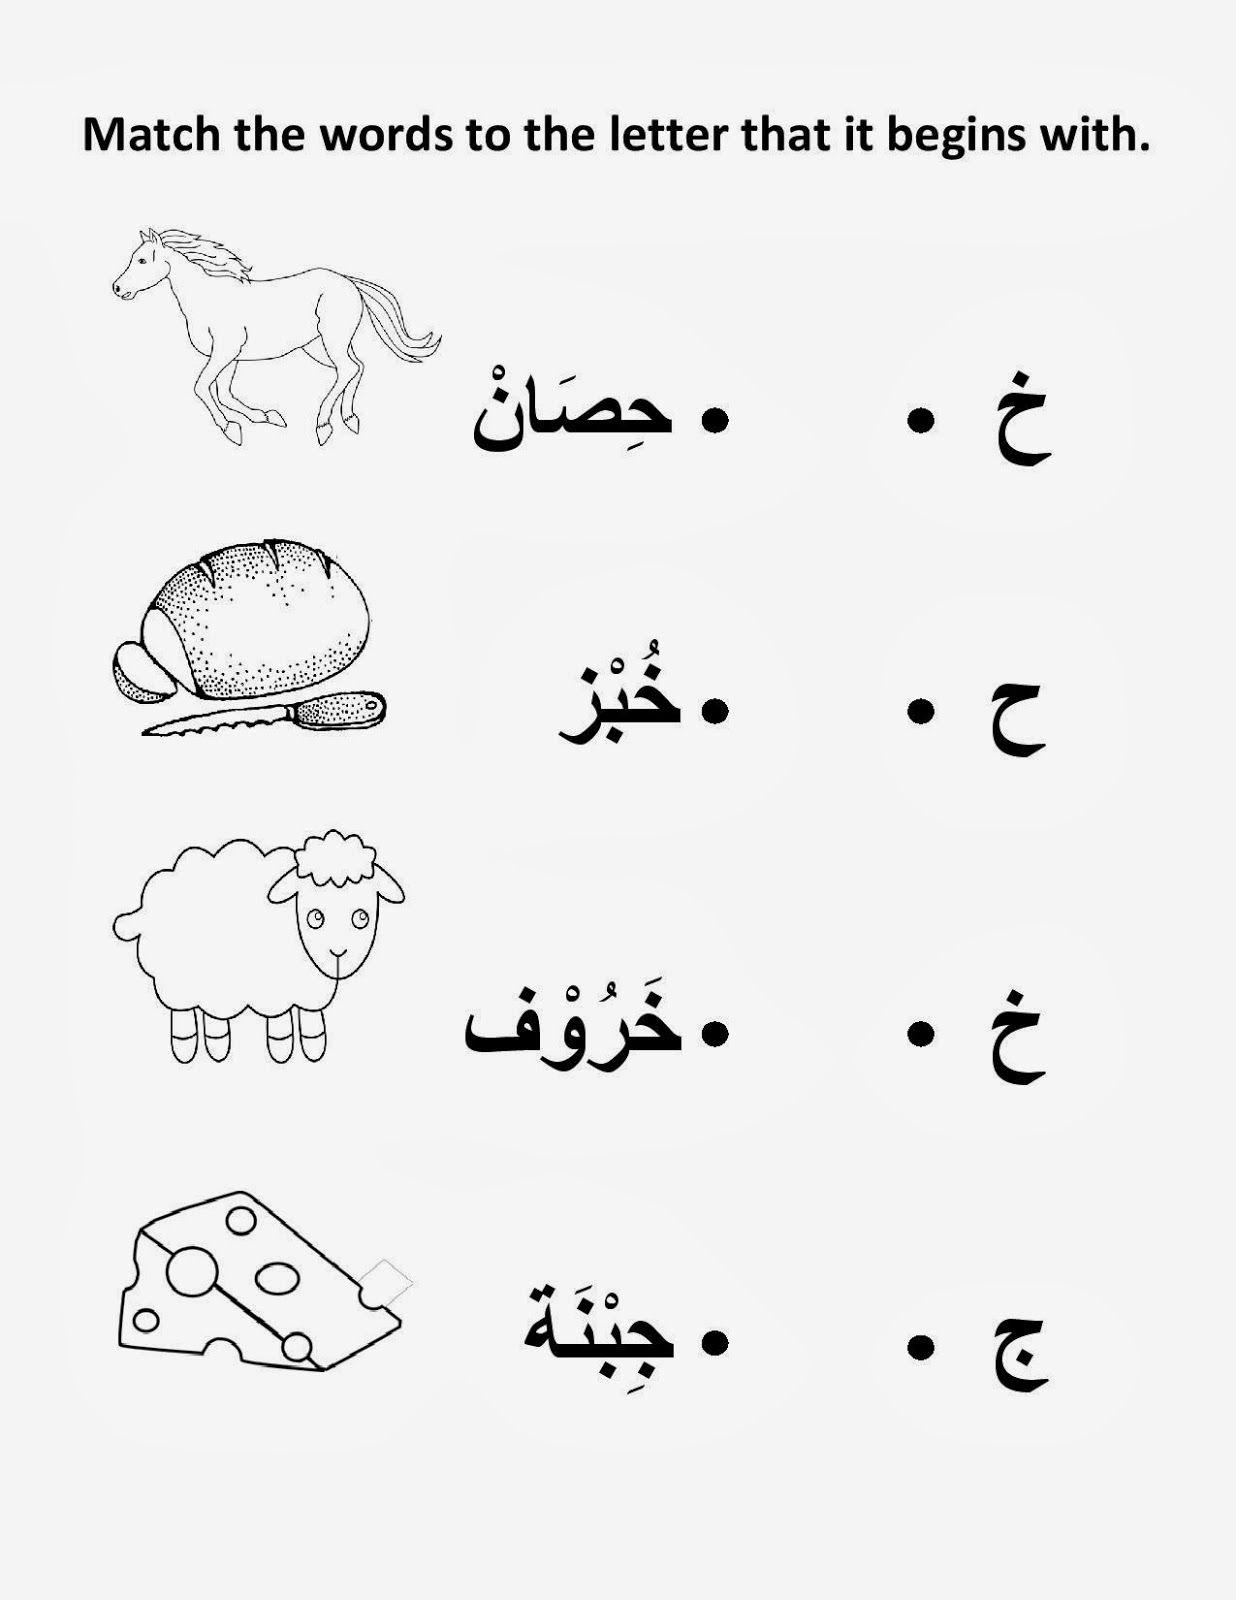 kuda dalam bahasa arab arabic worksheets learn arabic alphabet learning arabic arabic. Black Bedroom Furniture Sets. Home Design Ideas